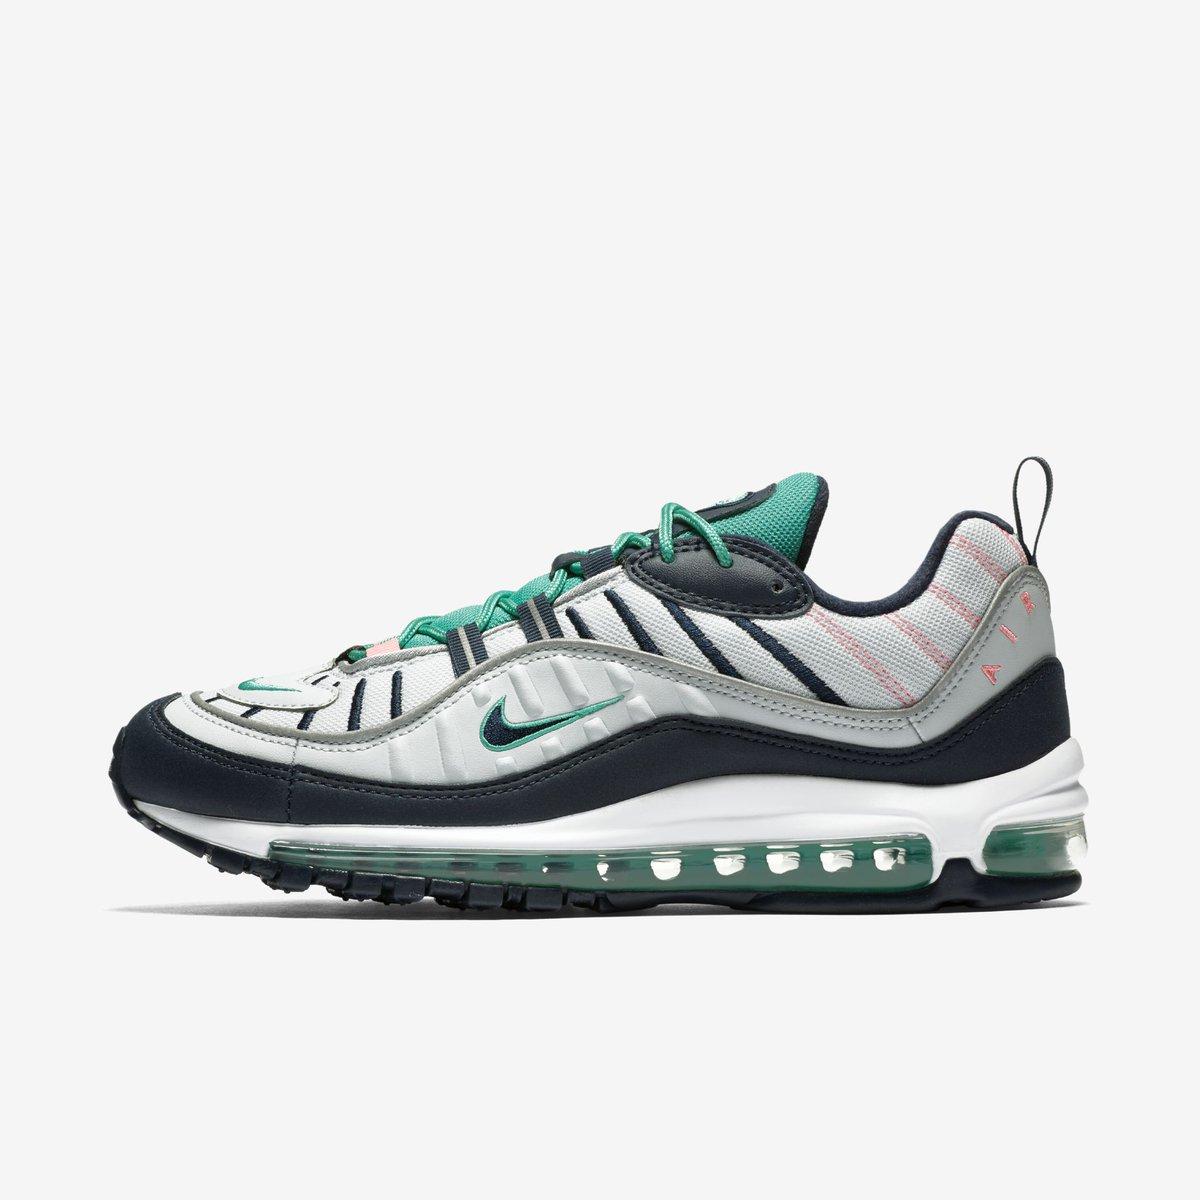 "bff2101639 LIVE: Nike Air Max 98 ""South Beach"" Foot Locker ->  https://go.j23app.com/735 Finish Line -> https://go.j23app.com/736 Villa ->  https://go.j23app.com/737 ..."